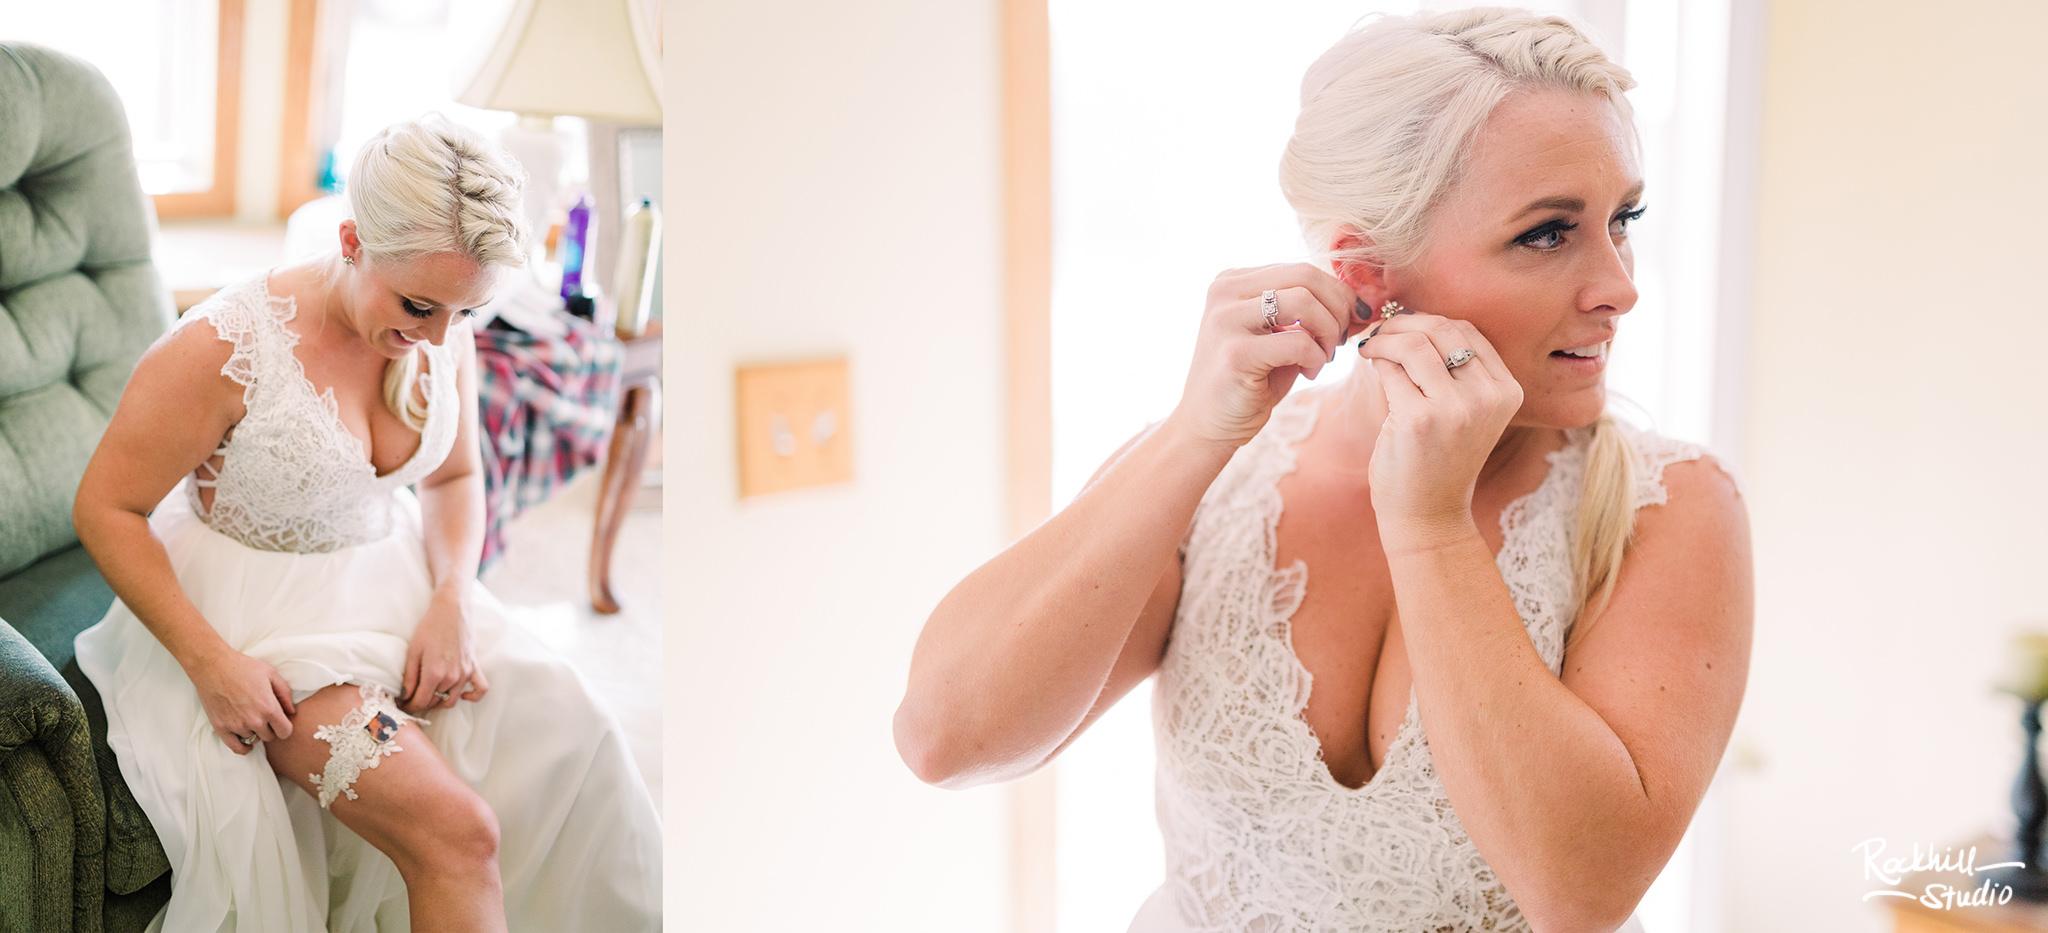 Traverse City Wedding Photographer, bride getting ready, Rockhill Studio